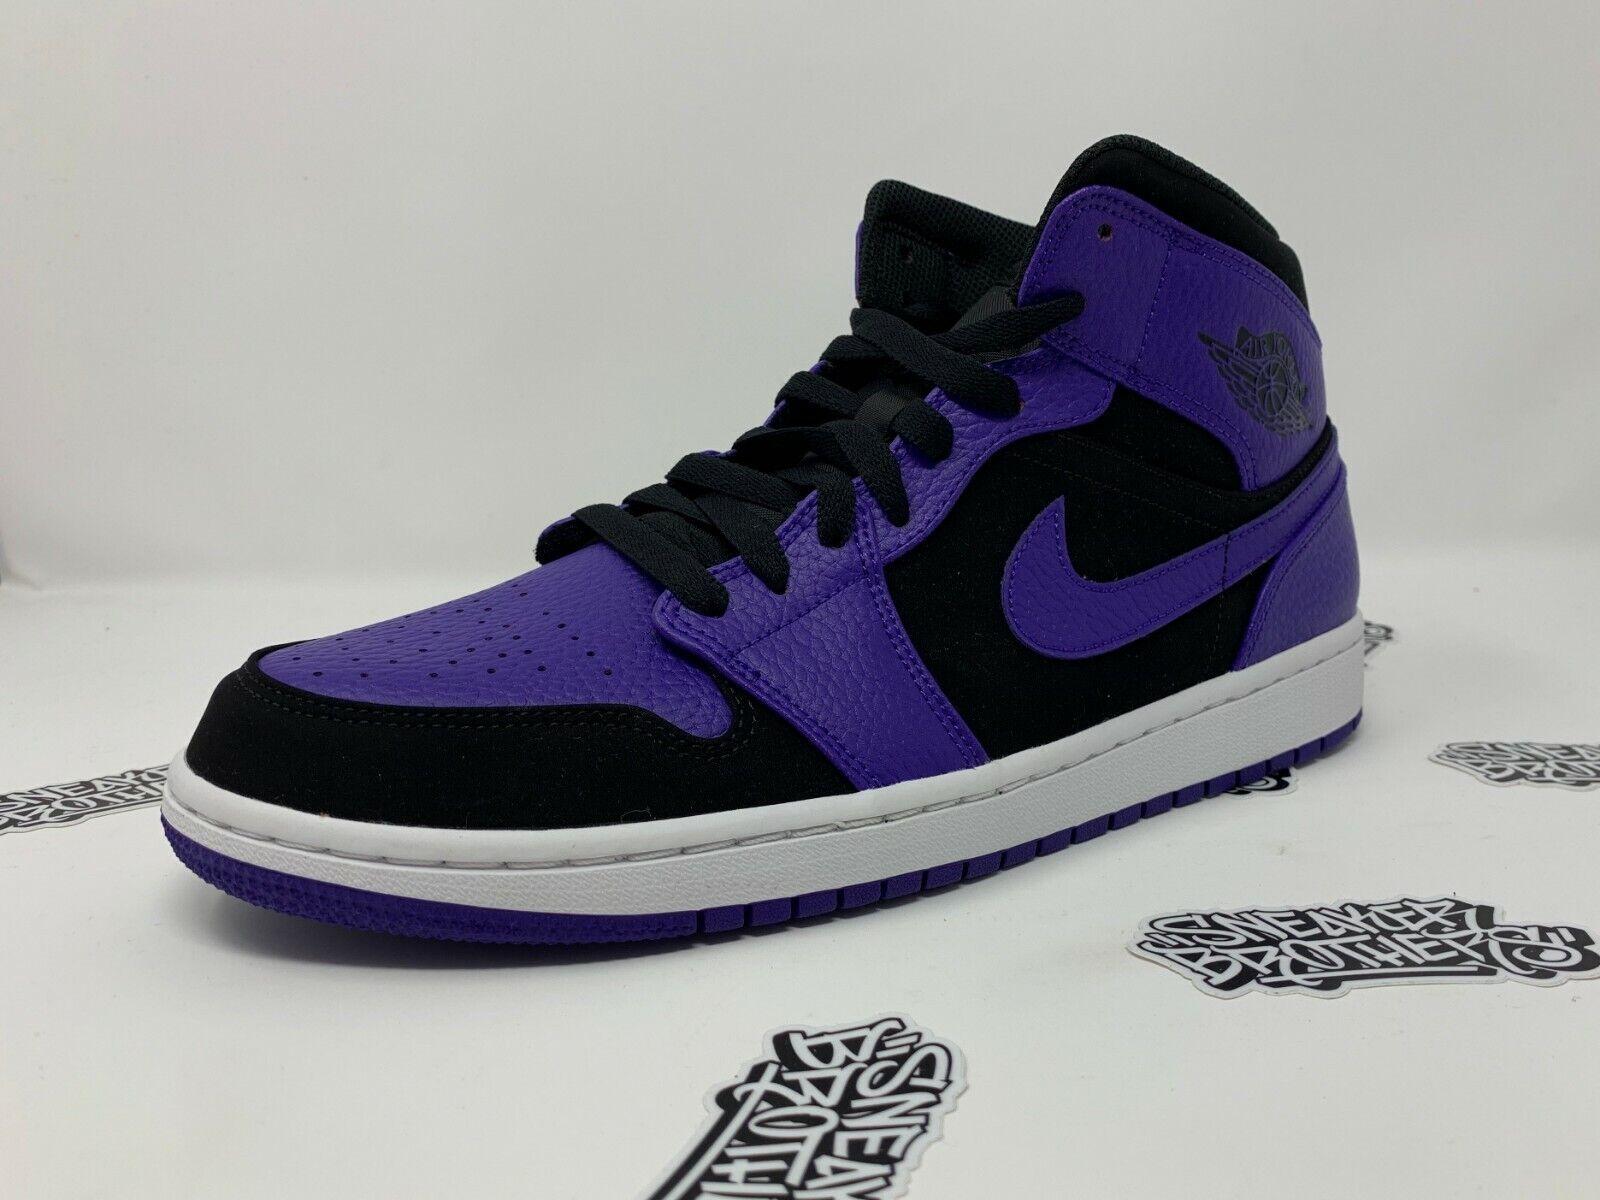 wholesale dealer 27ffc 22fbe Nike Air Jordan Retro I 1 Mid Black Dark Concord Purple White 554724-051